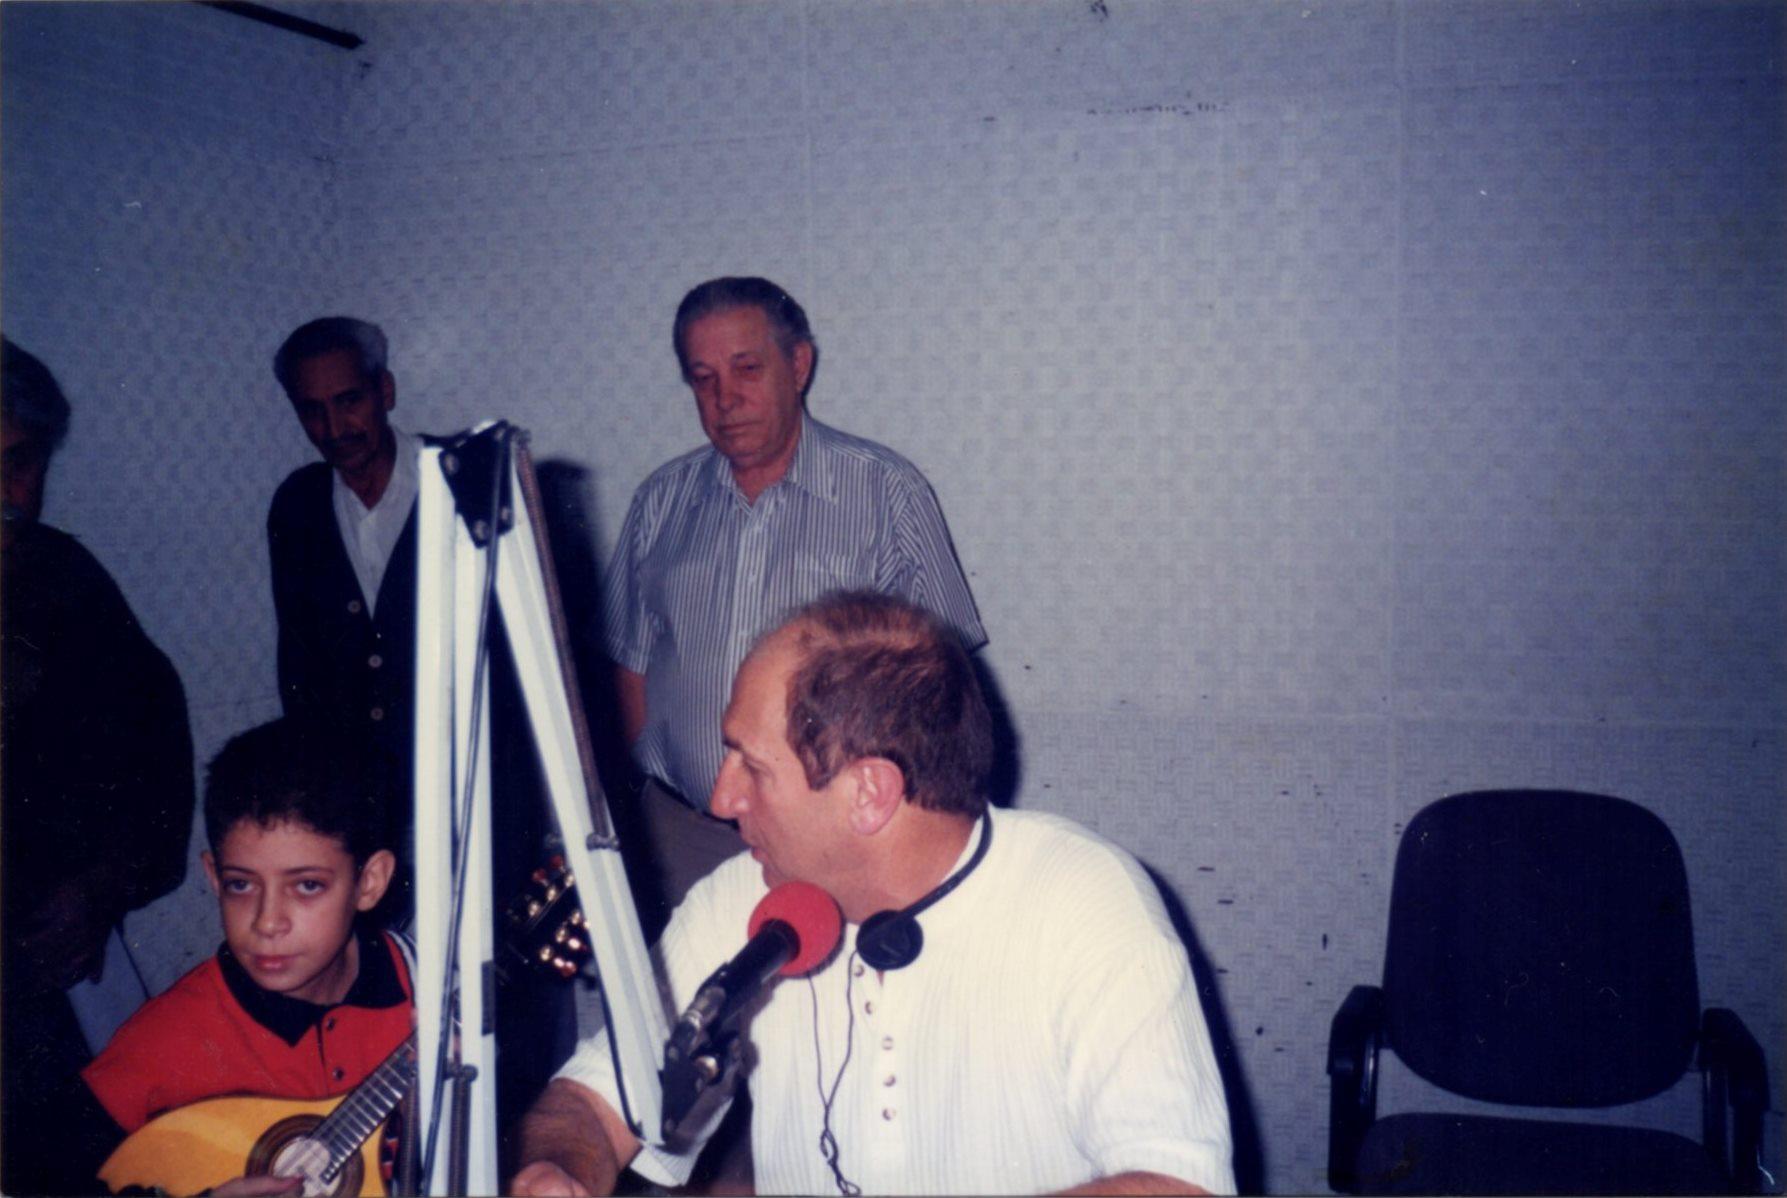 Na Rádio Iguatemi, com José Carlos Gomes